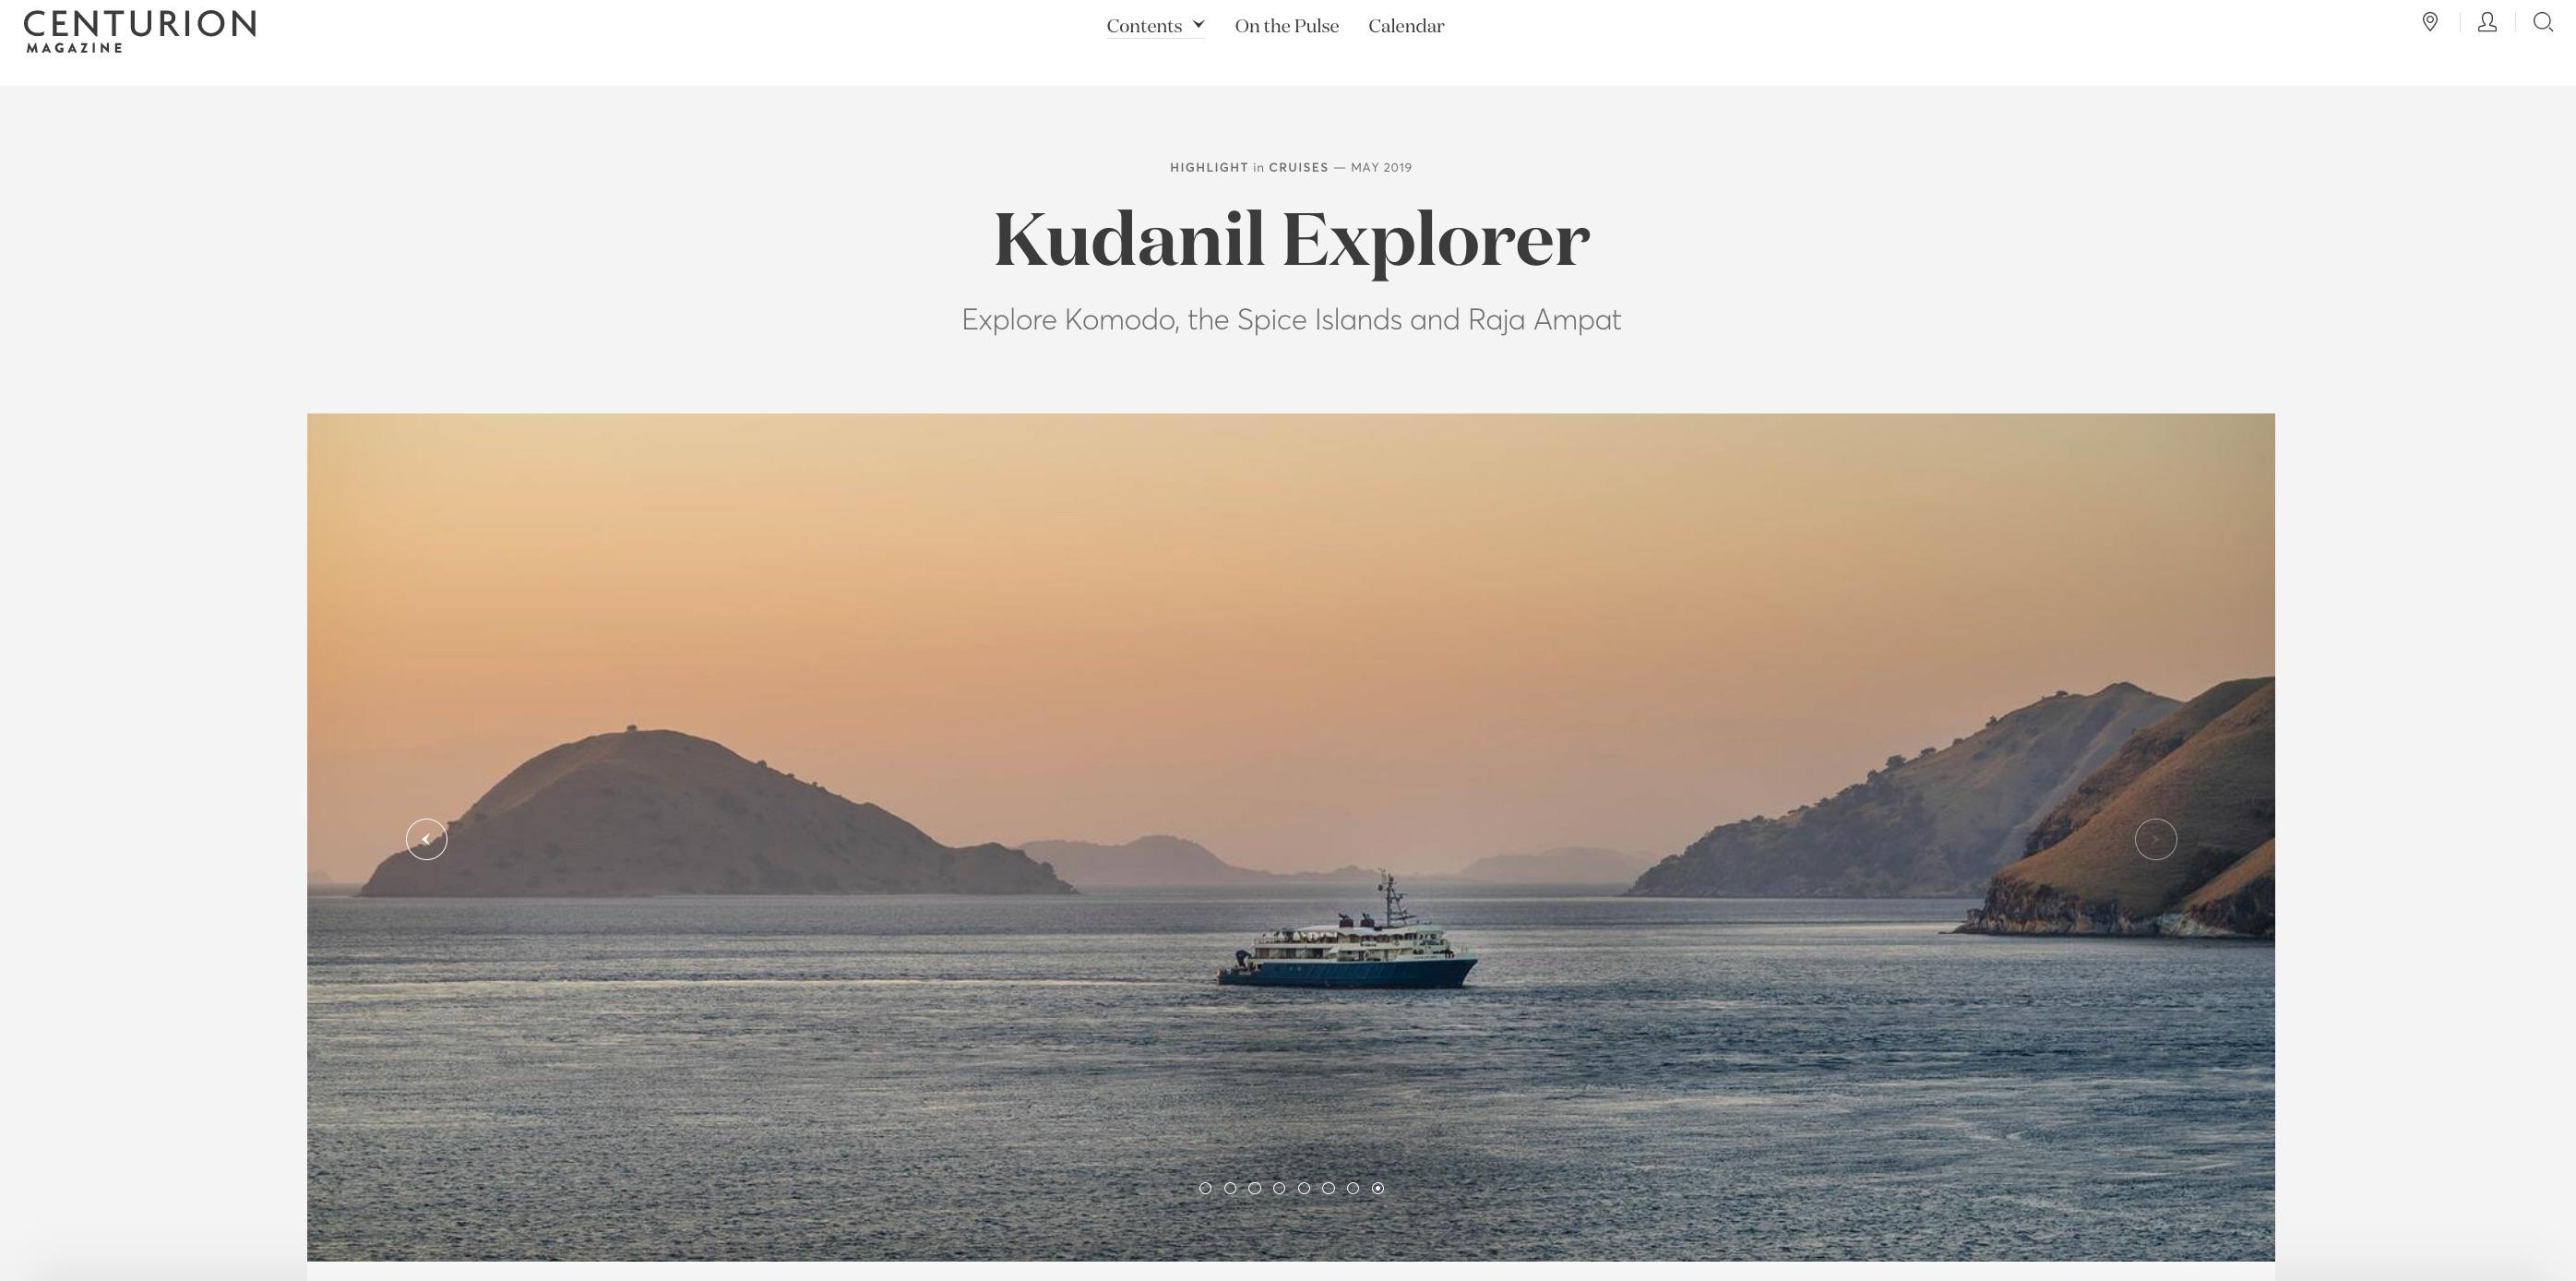 Kudanil Explorer in Centurion Magazine